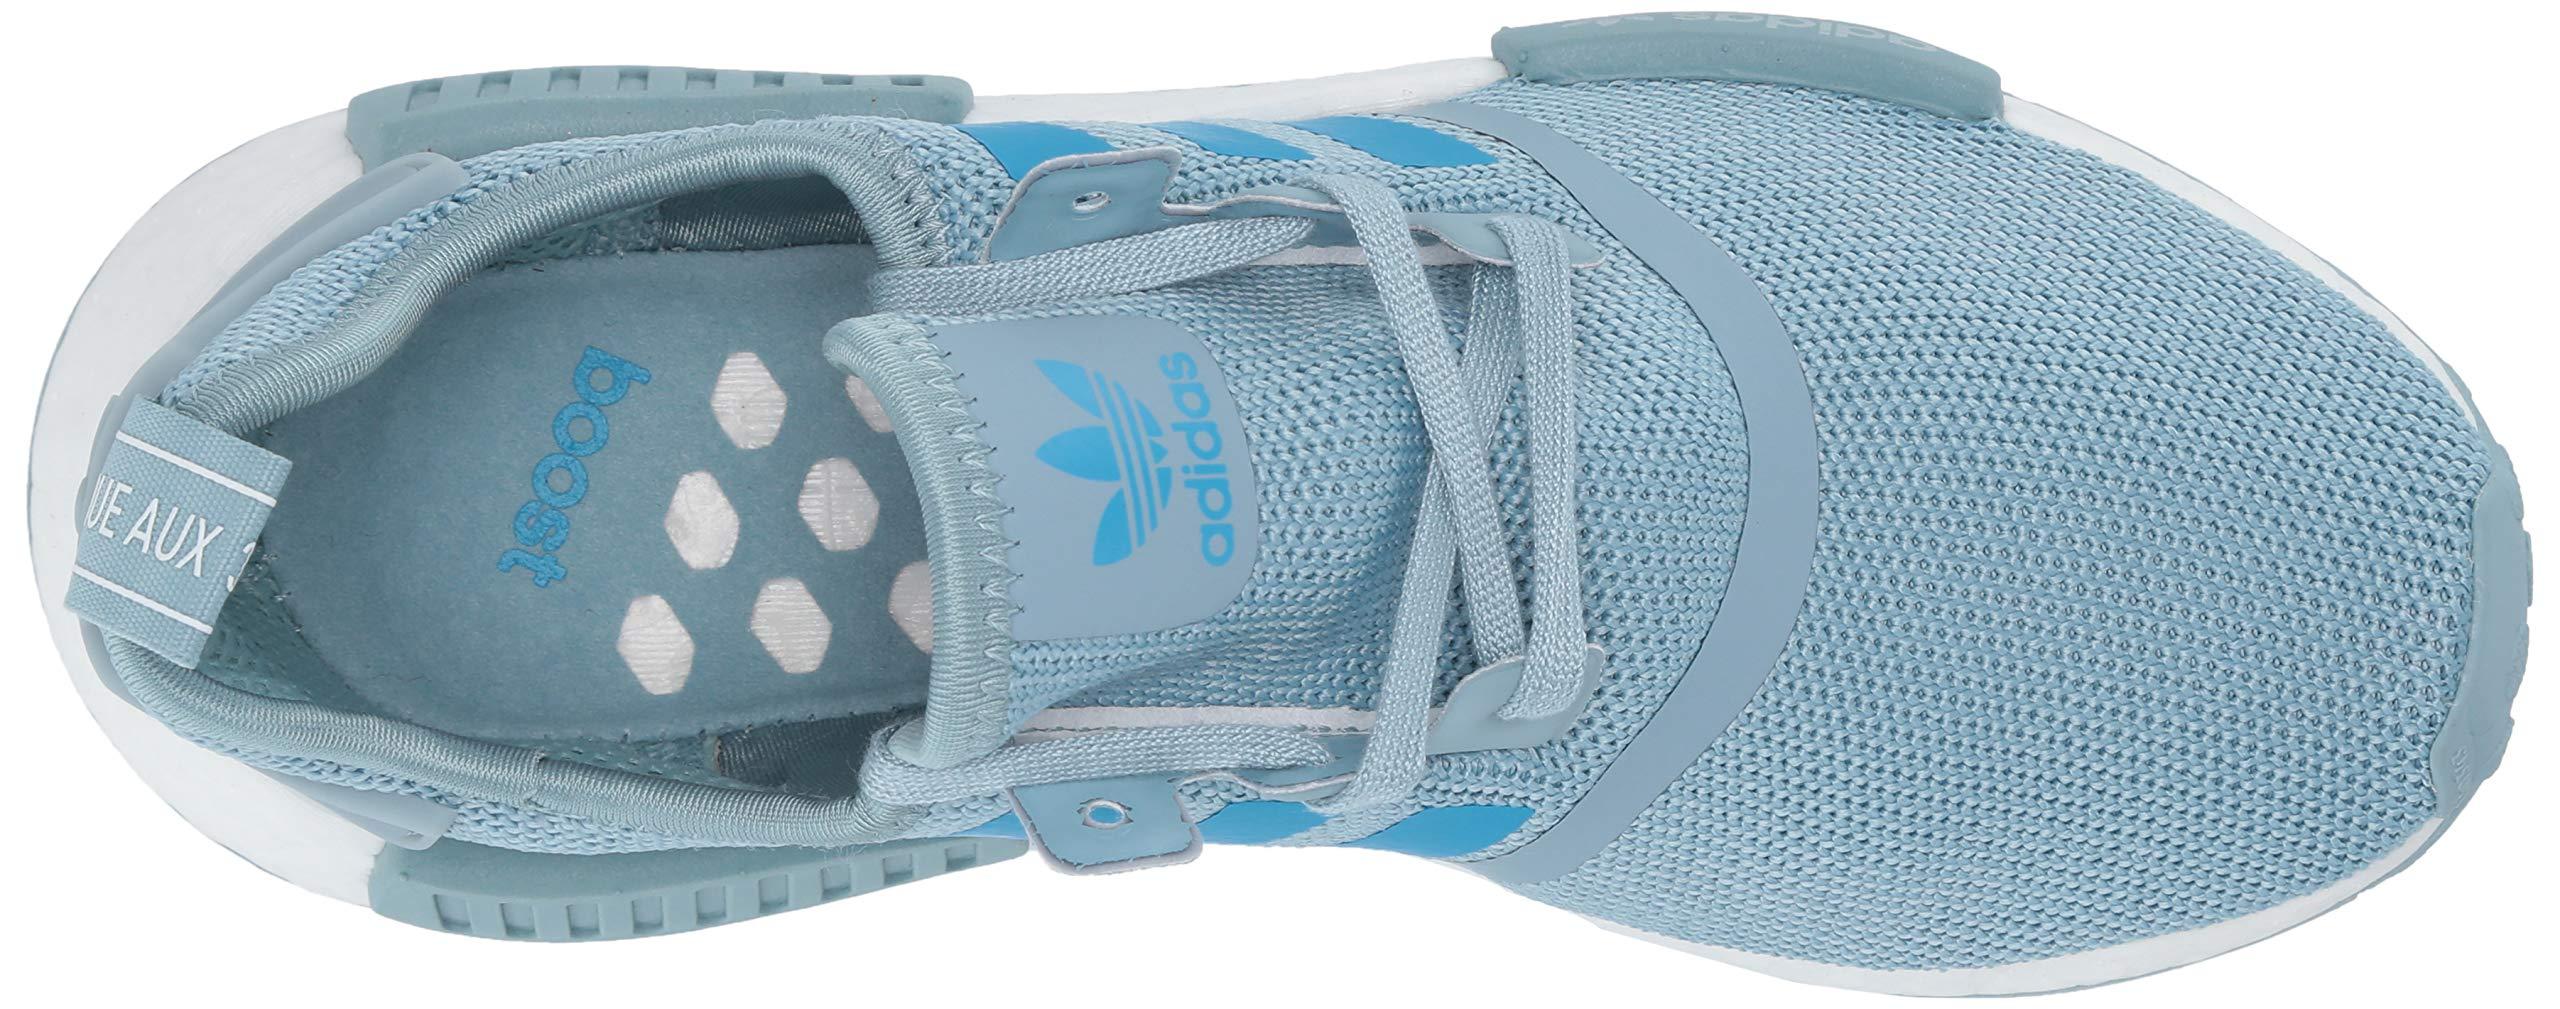 adidas Originals Unisex NMD_R1 Running Shoe ash Grey/Shock Cyan/White 4 M US Big Kid by adidas Originals (Image #8)